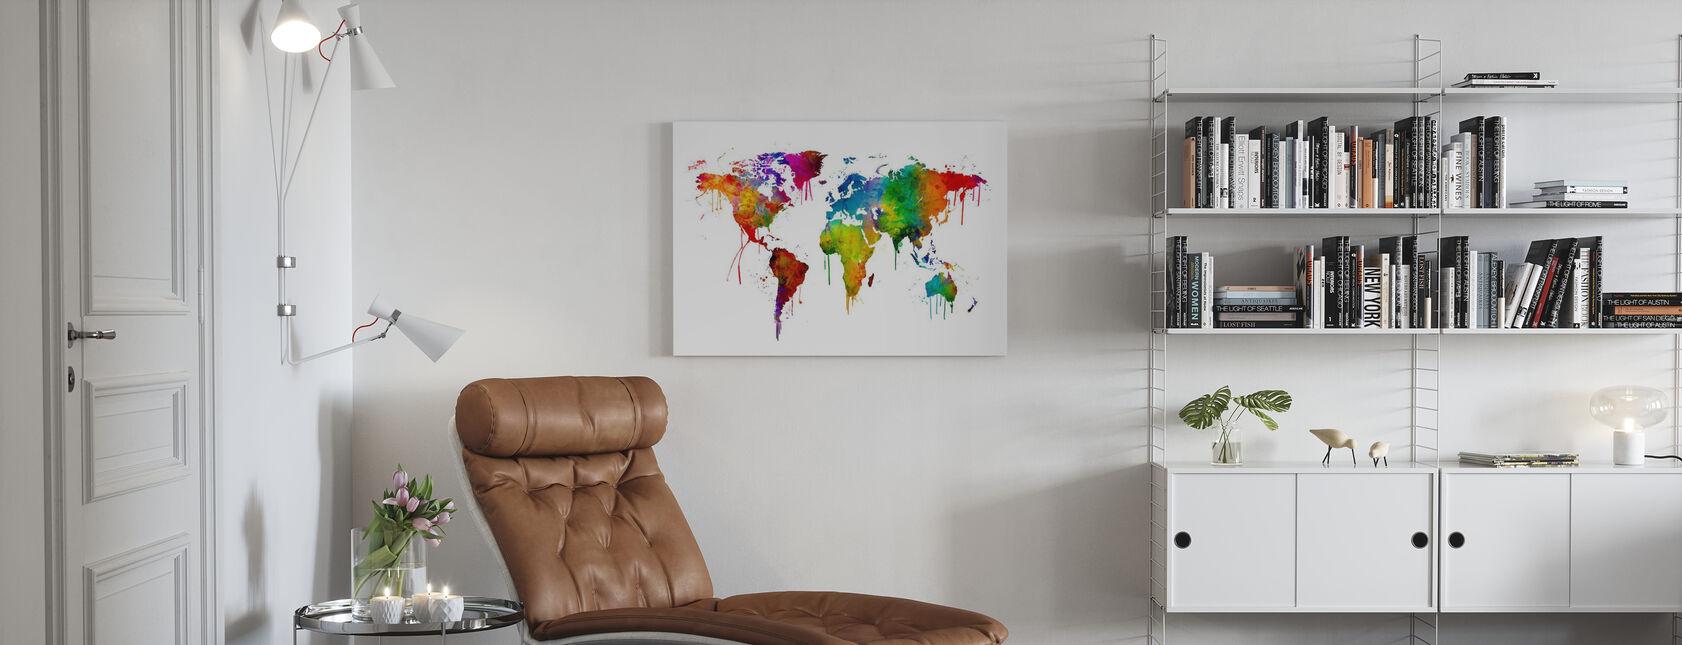 Akvarell World Karta - Canvastavla - Vardagsrum